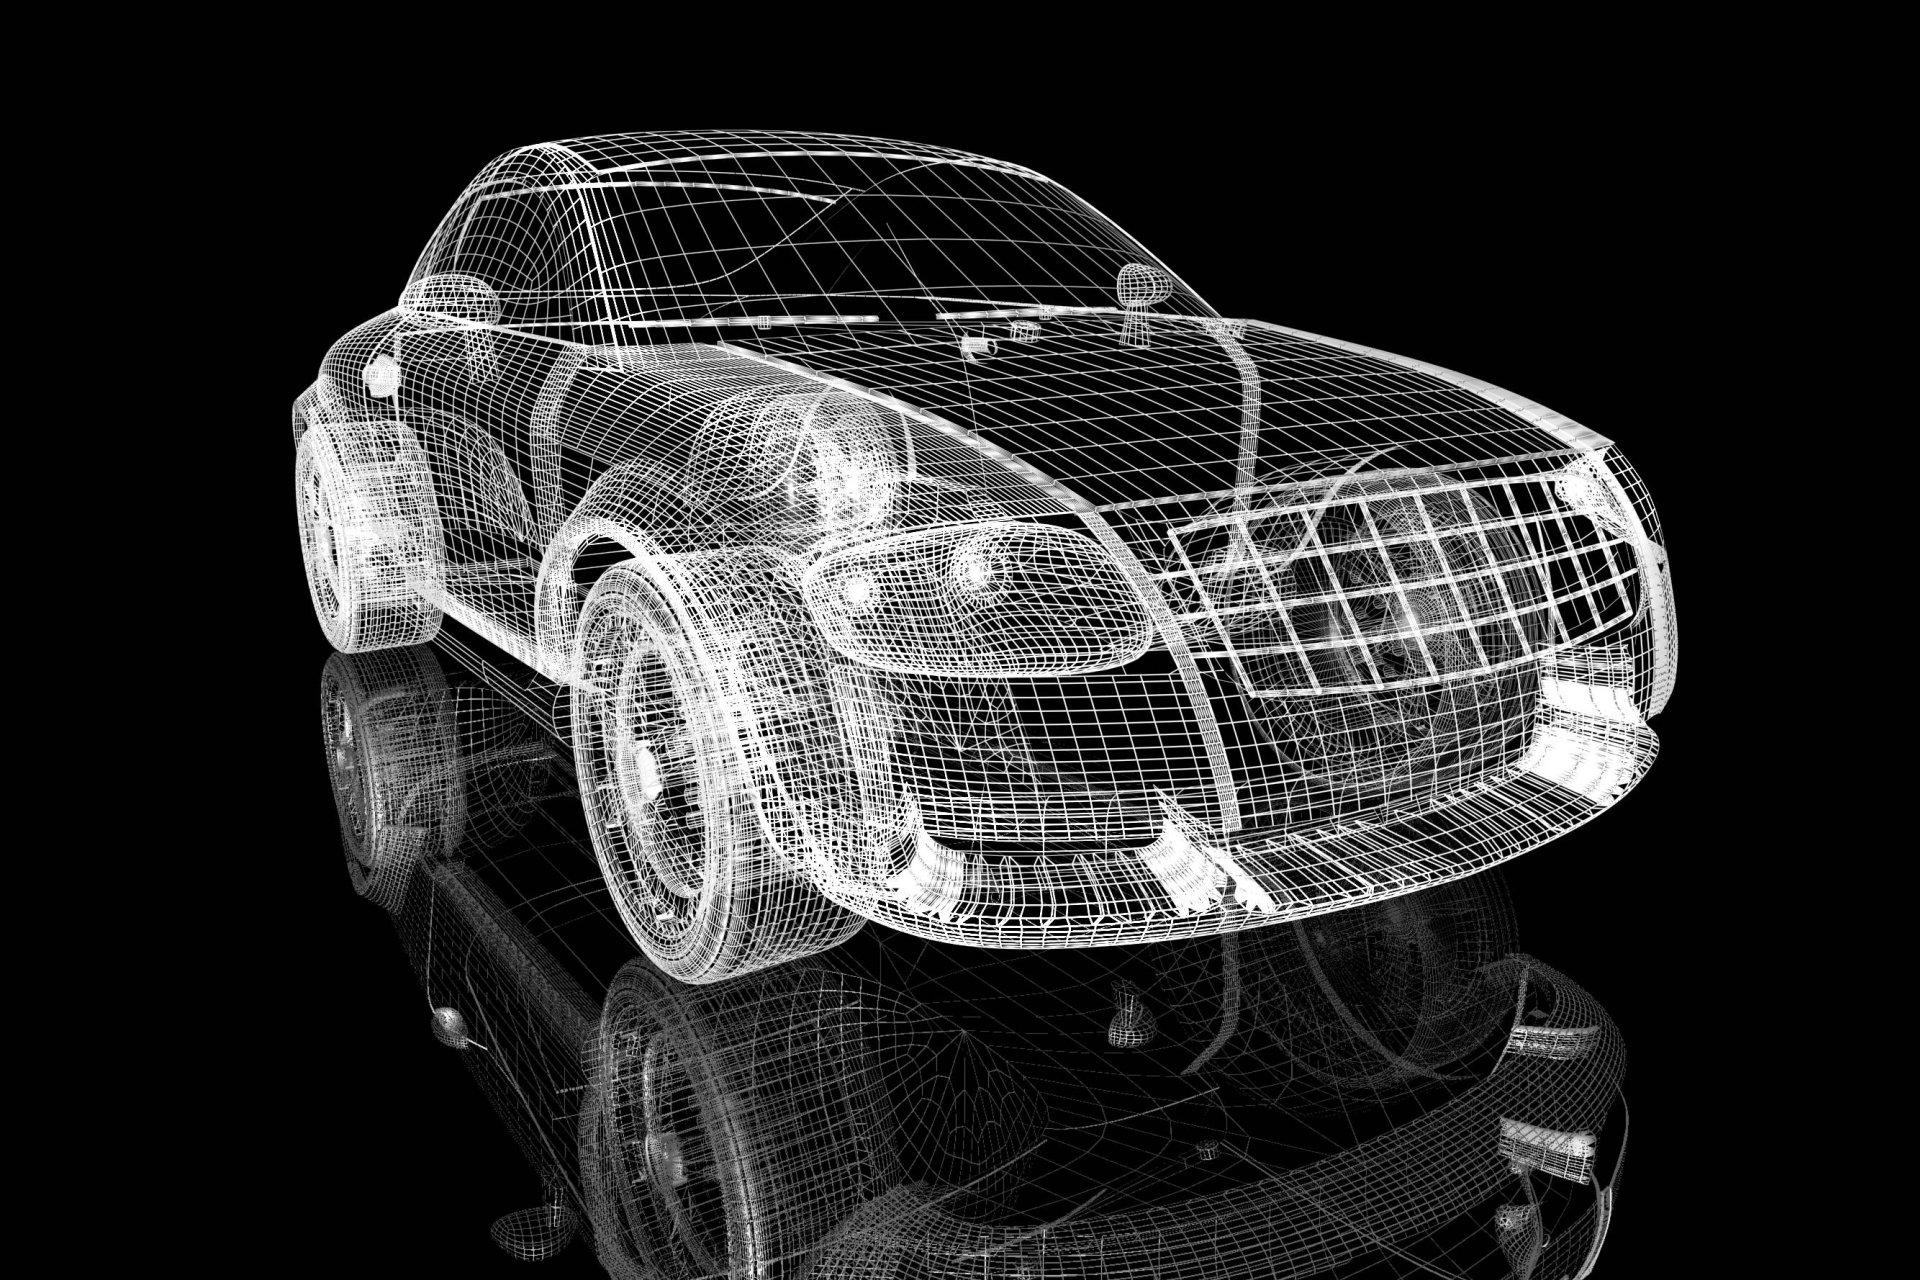 EITC/CG/BL1 3D graphics design and visualisation software (Blender) 1